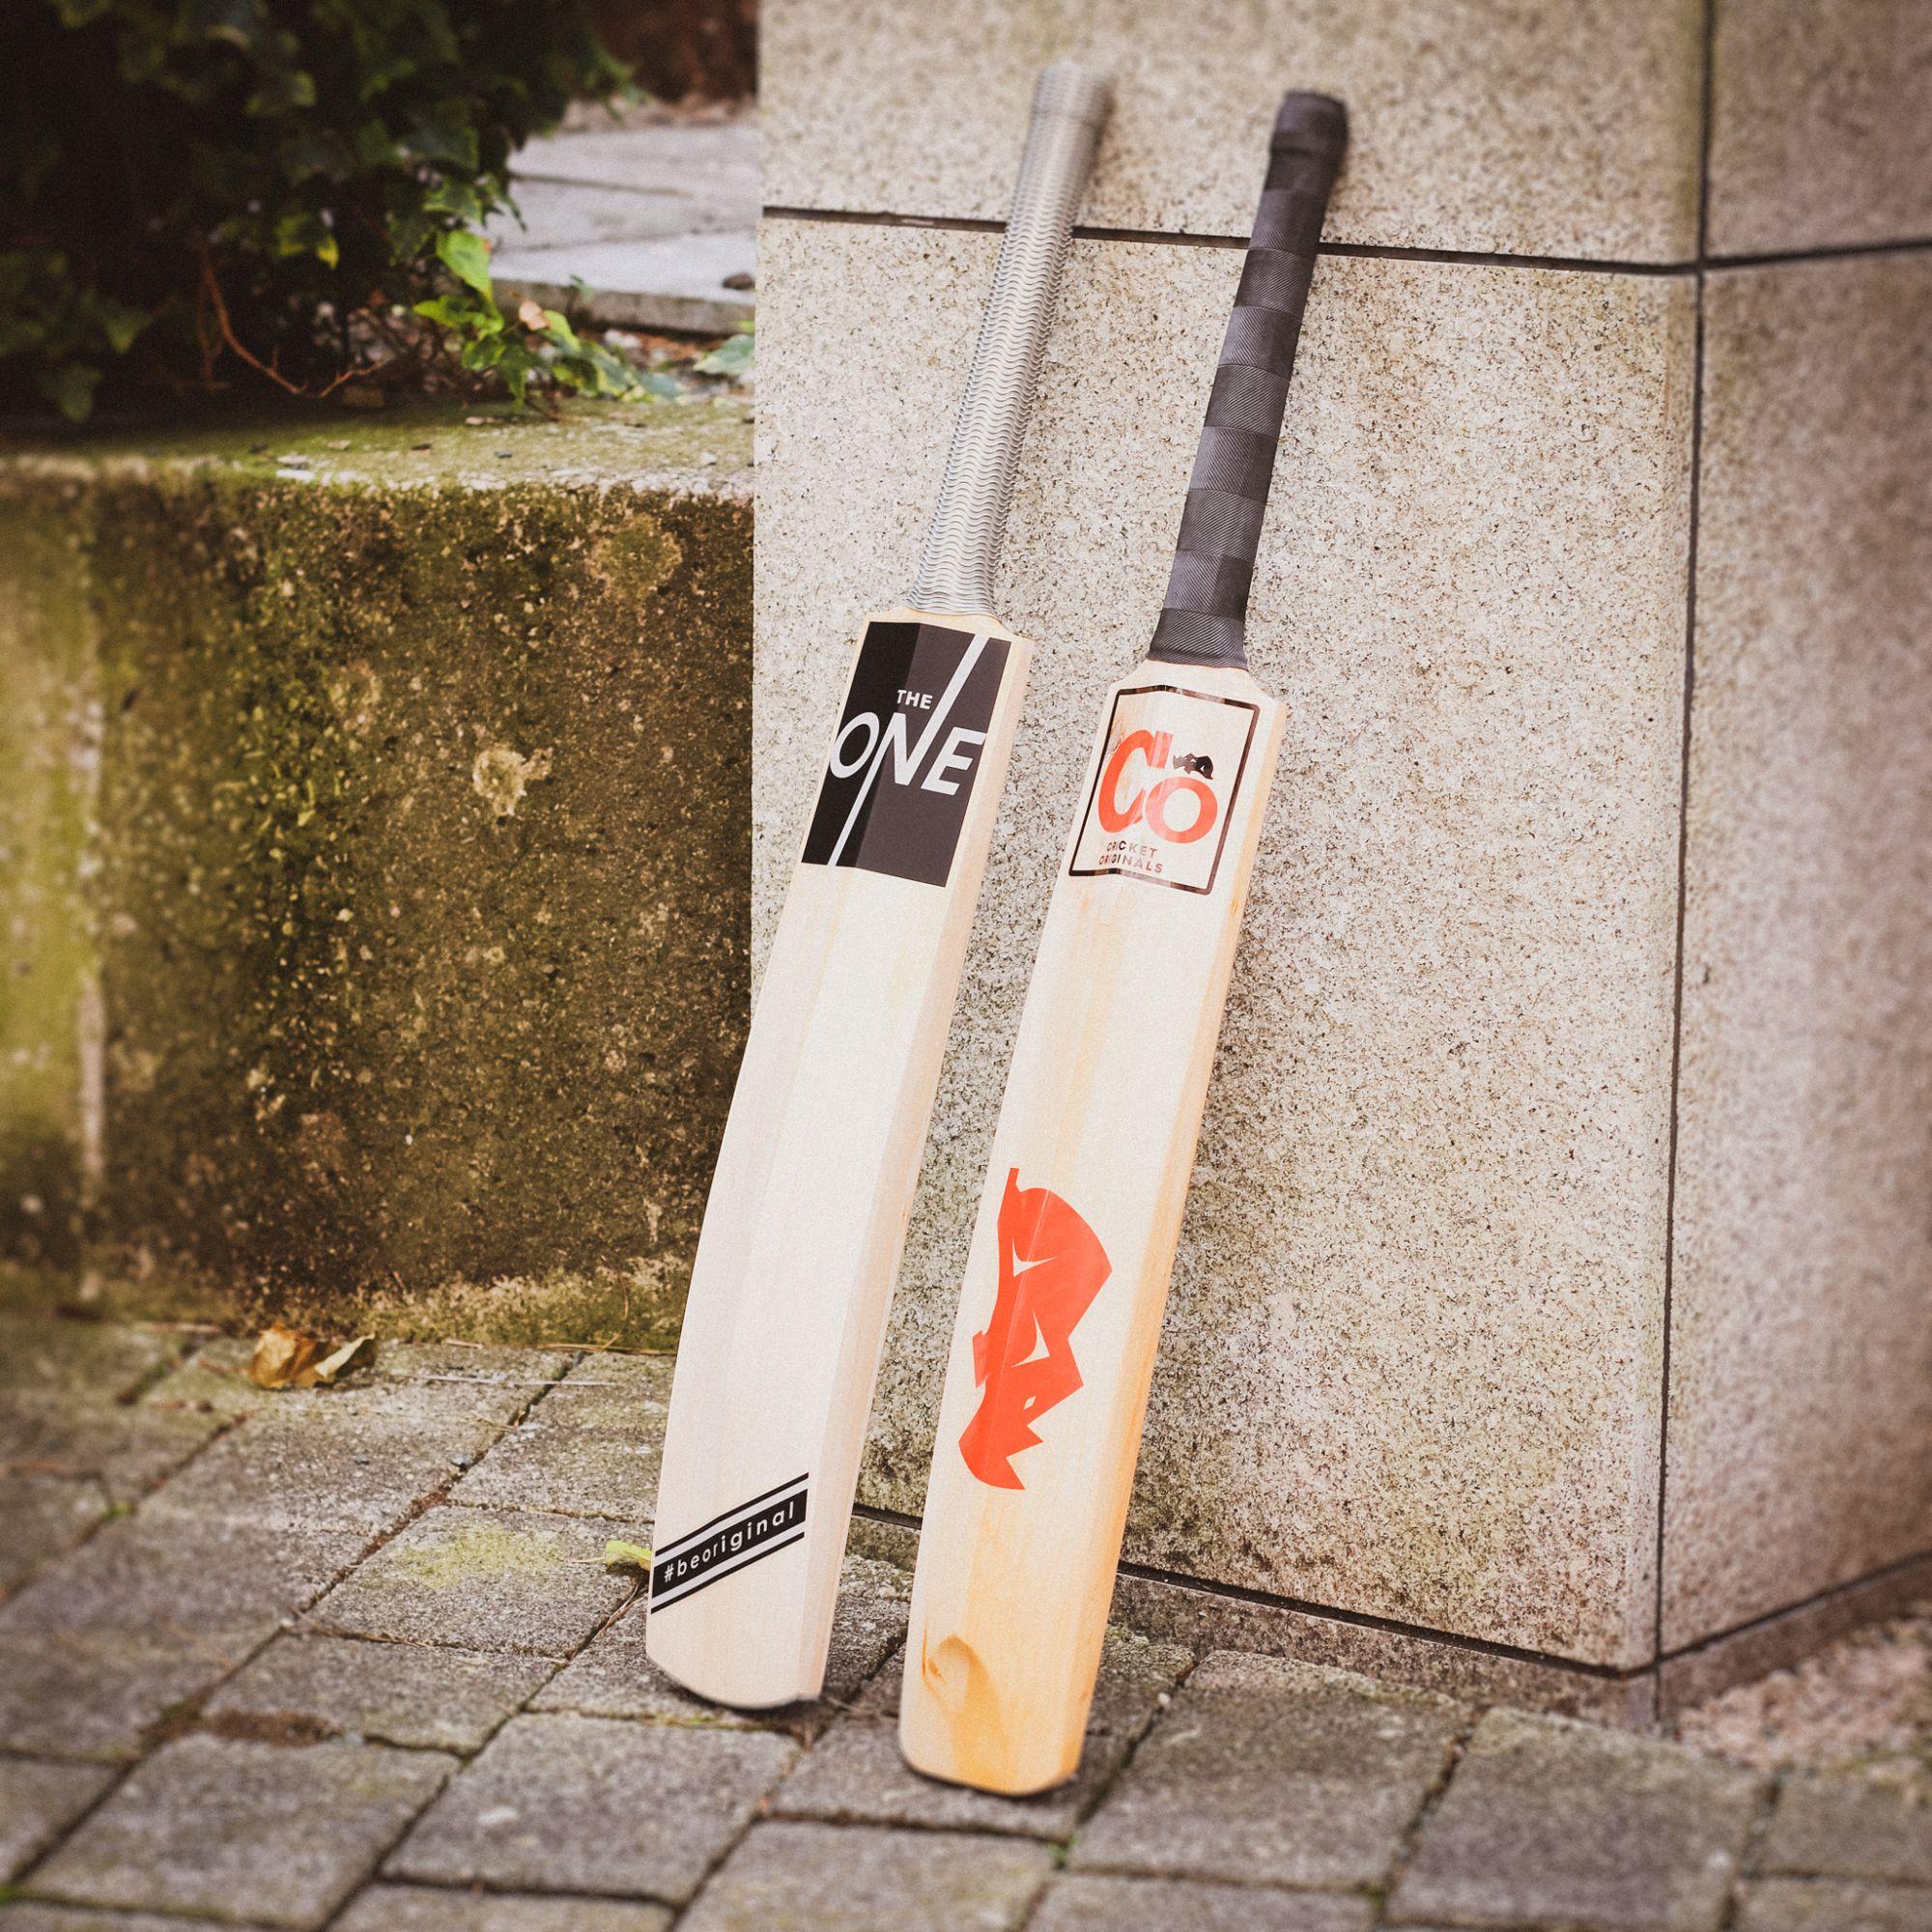 UK Made Cricket Bats